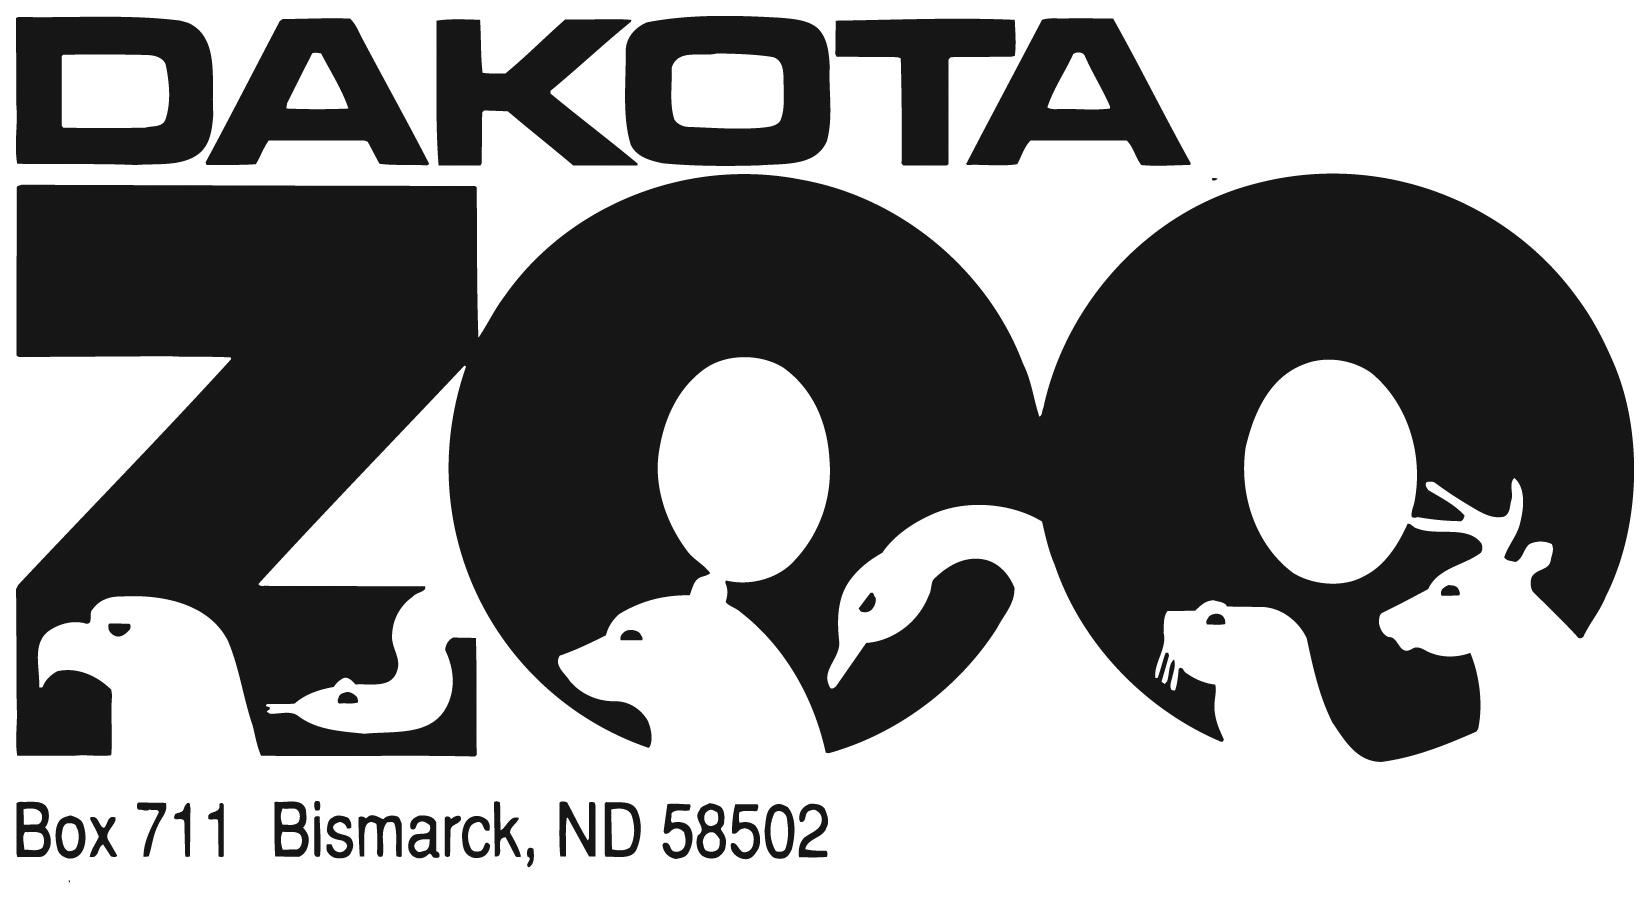 dakota zoo at the zoo